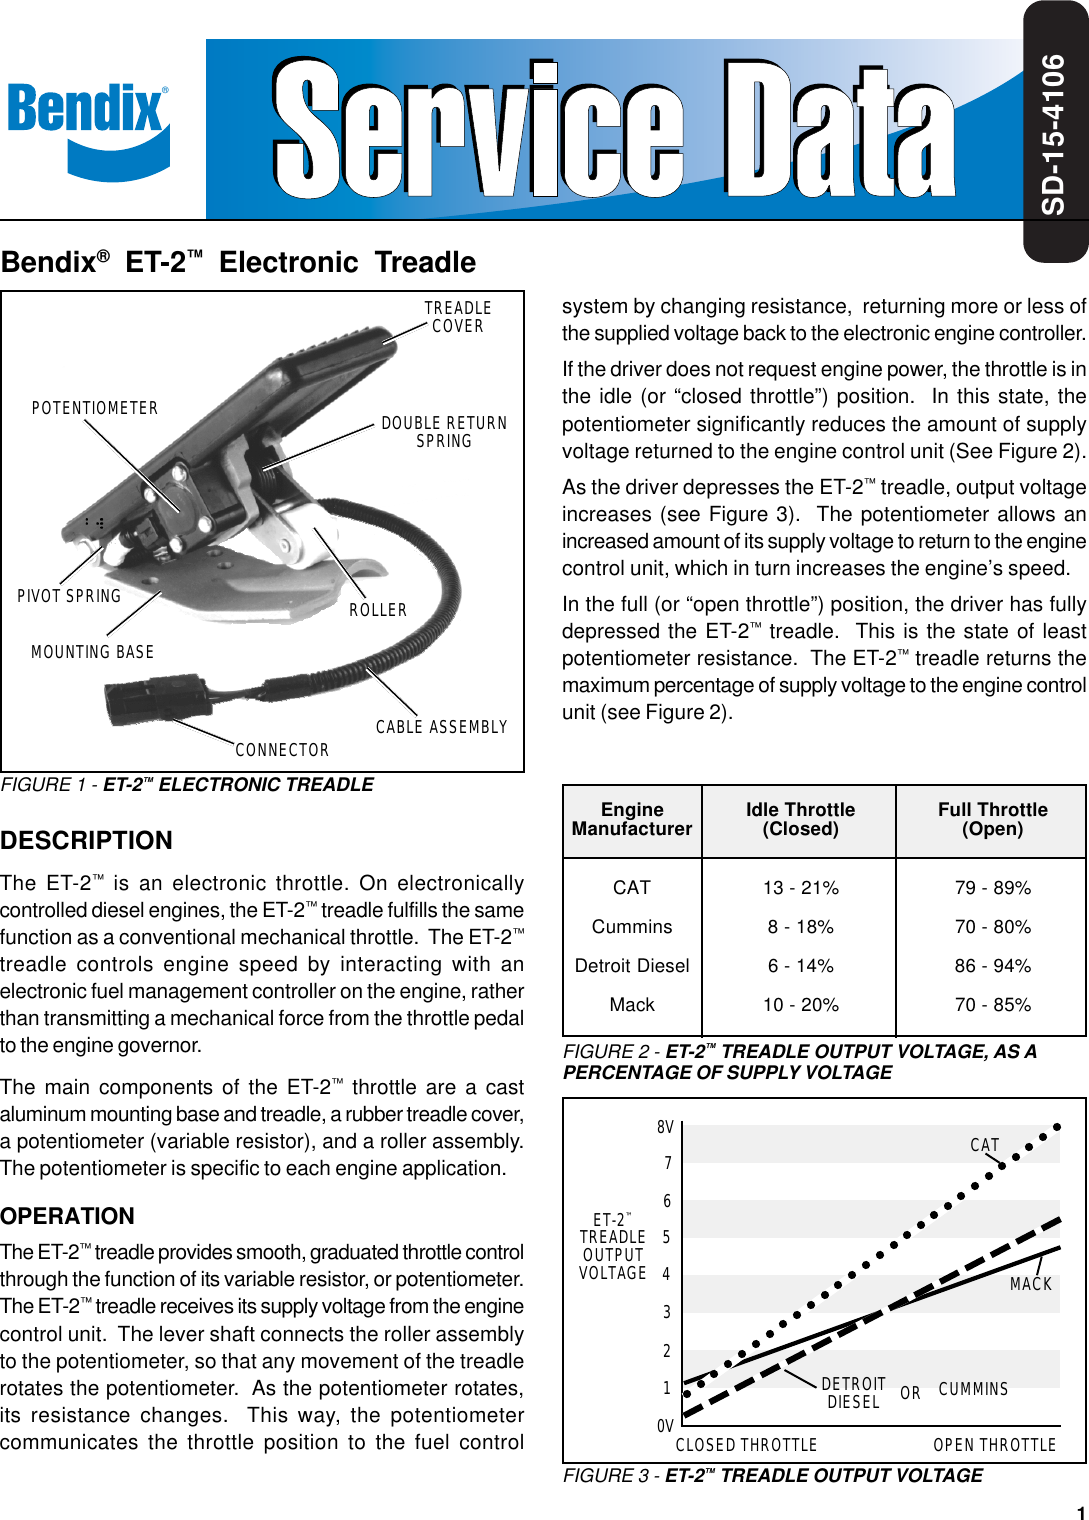 Bendix Bw1650 Users Manual SD154106